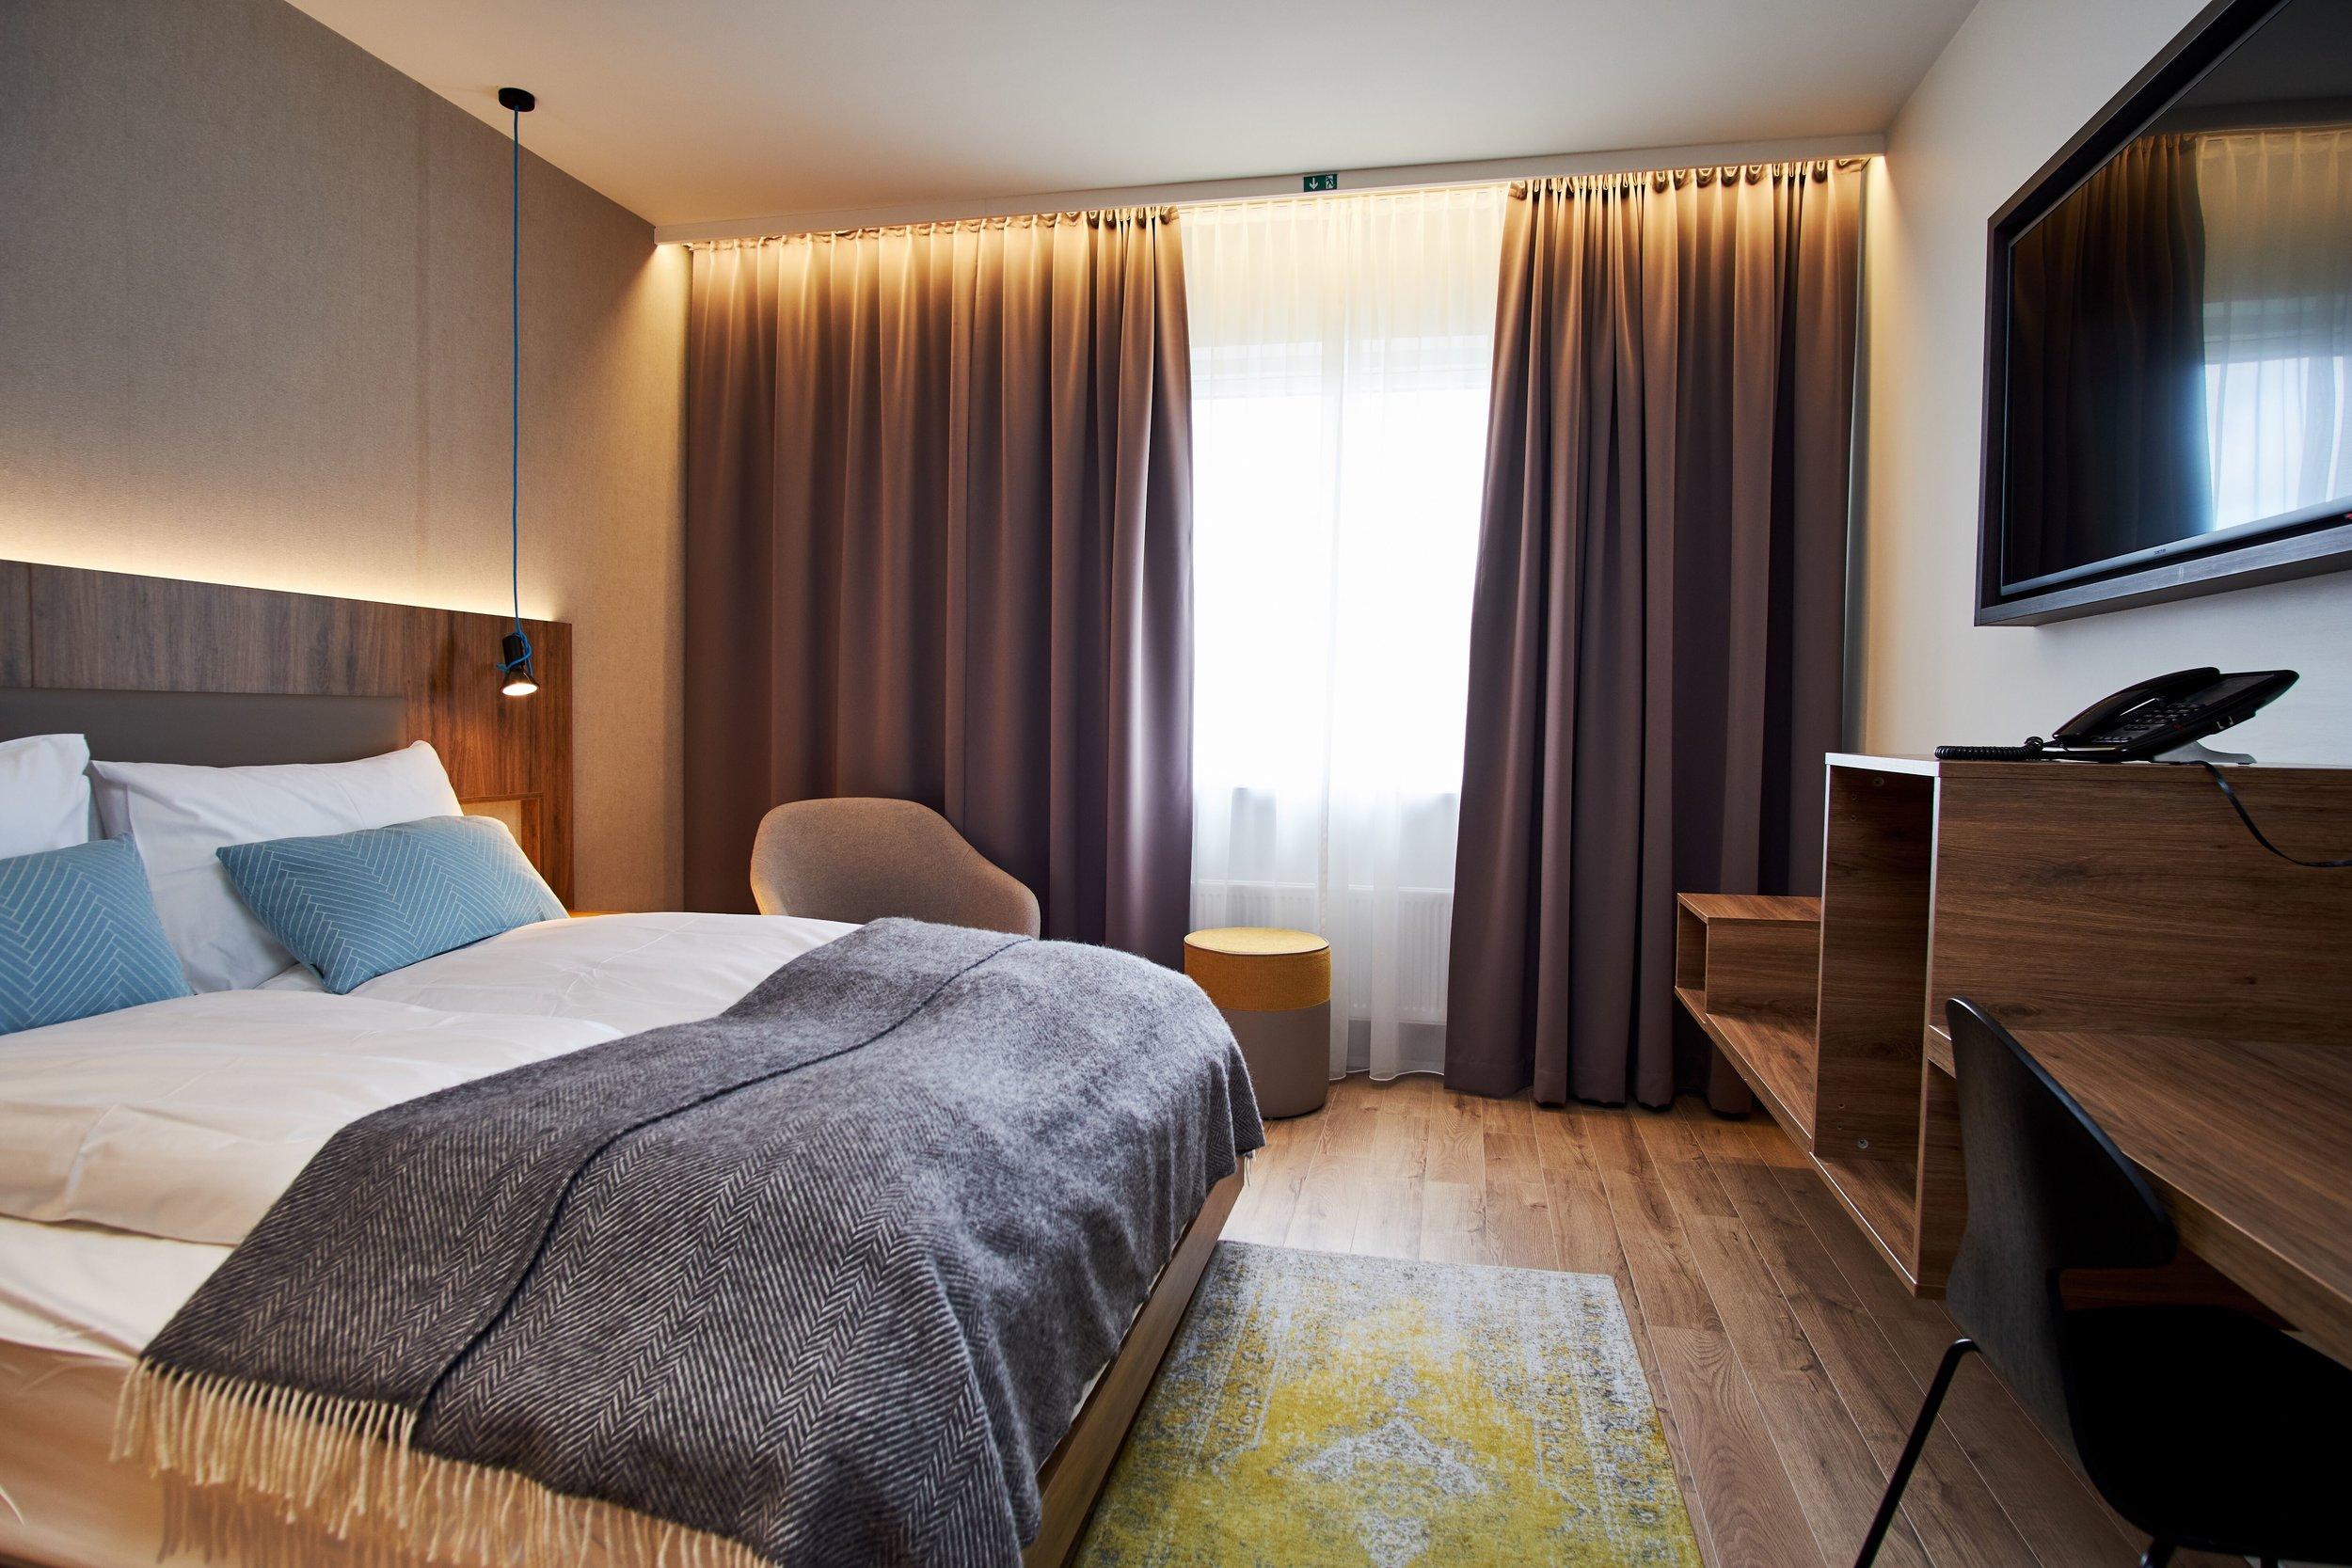 Copy of Standard Double Room